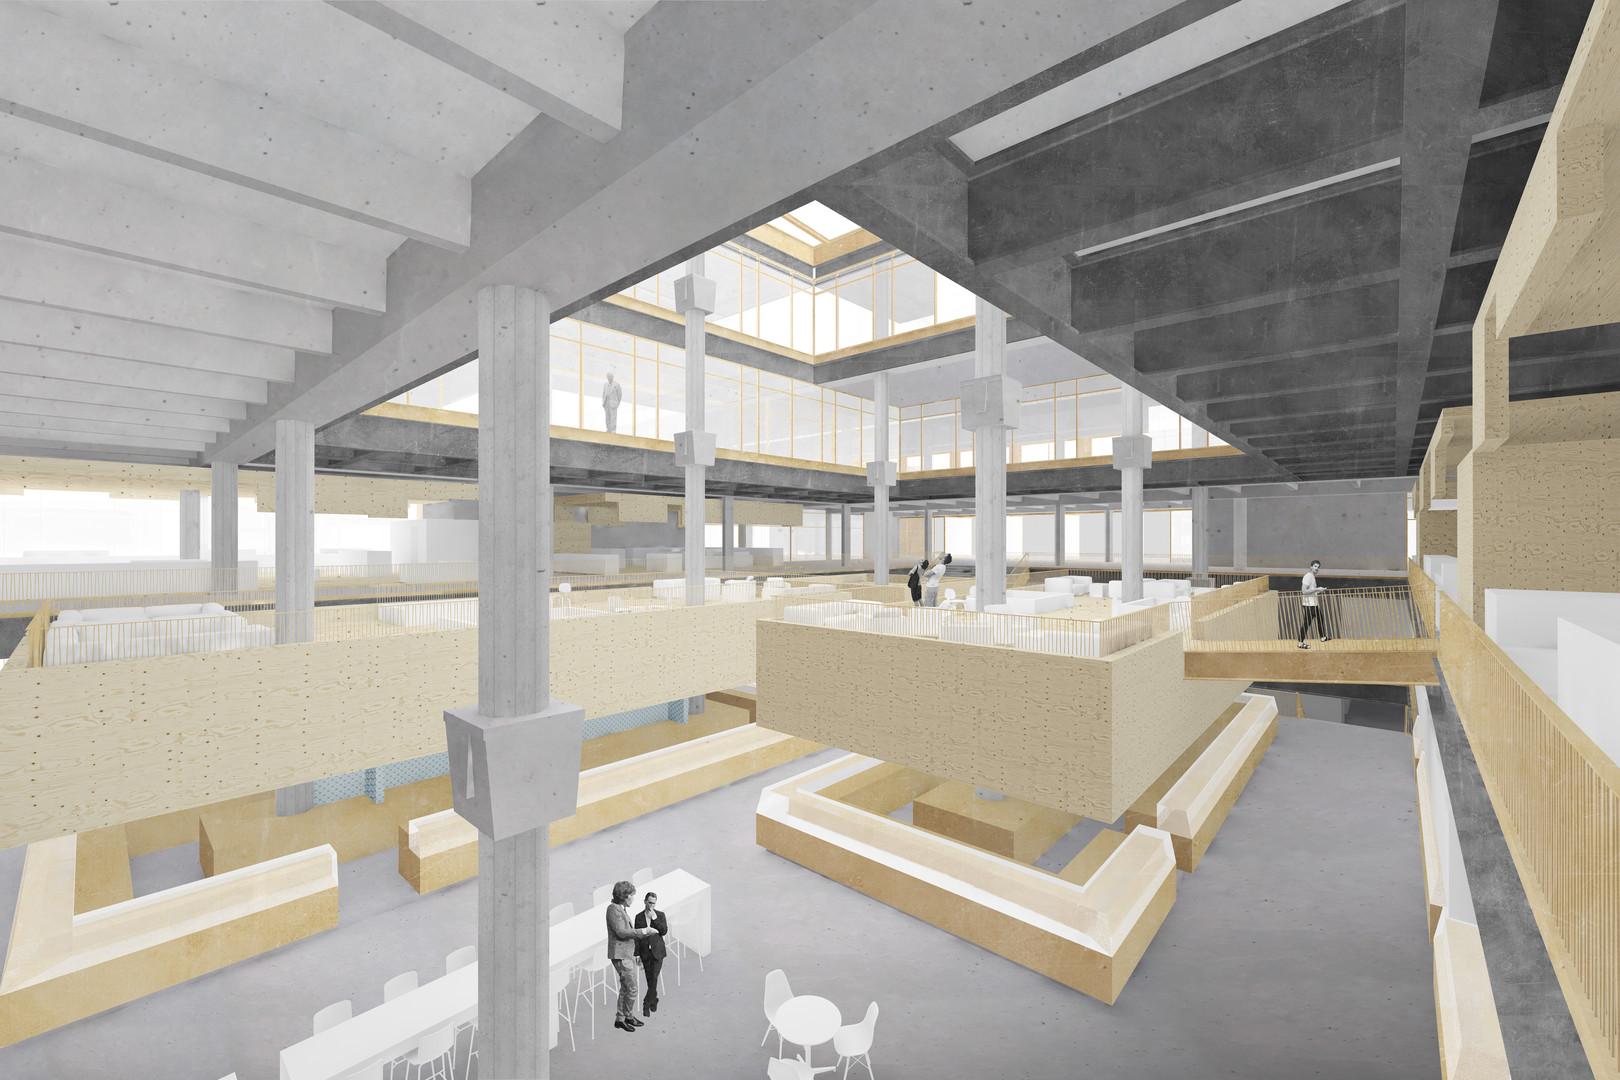 01_Concept-Mall.jpg